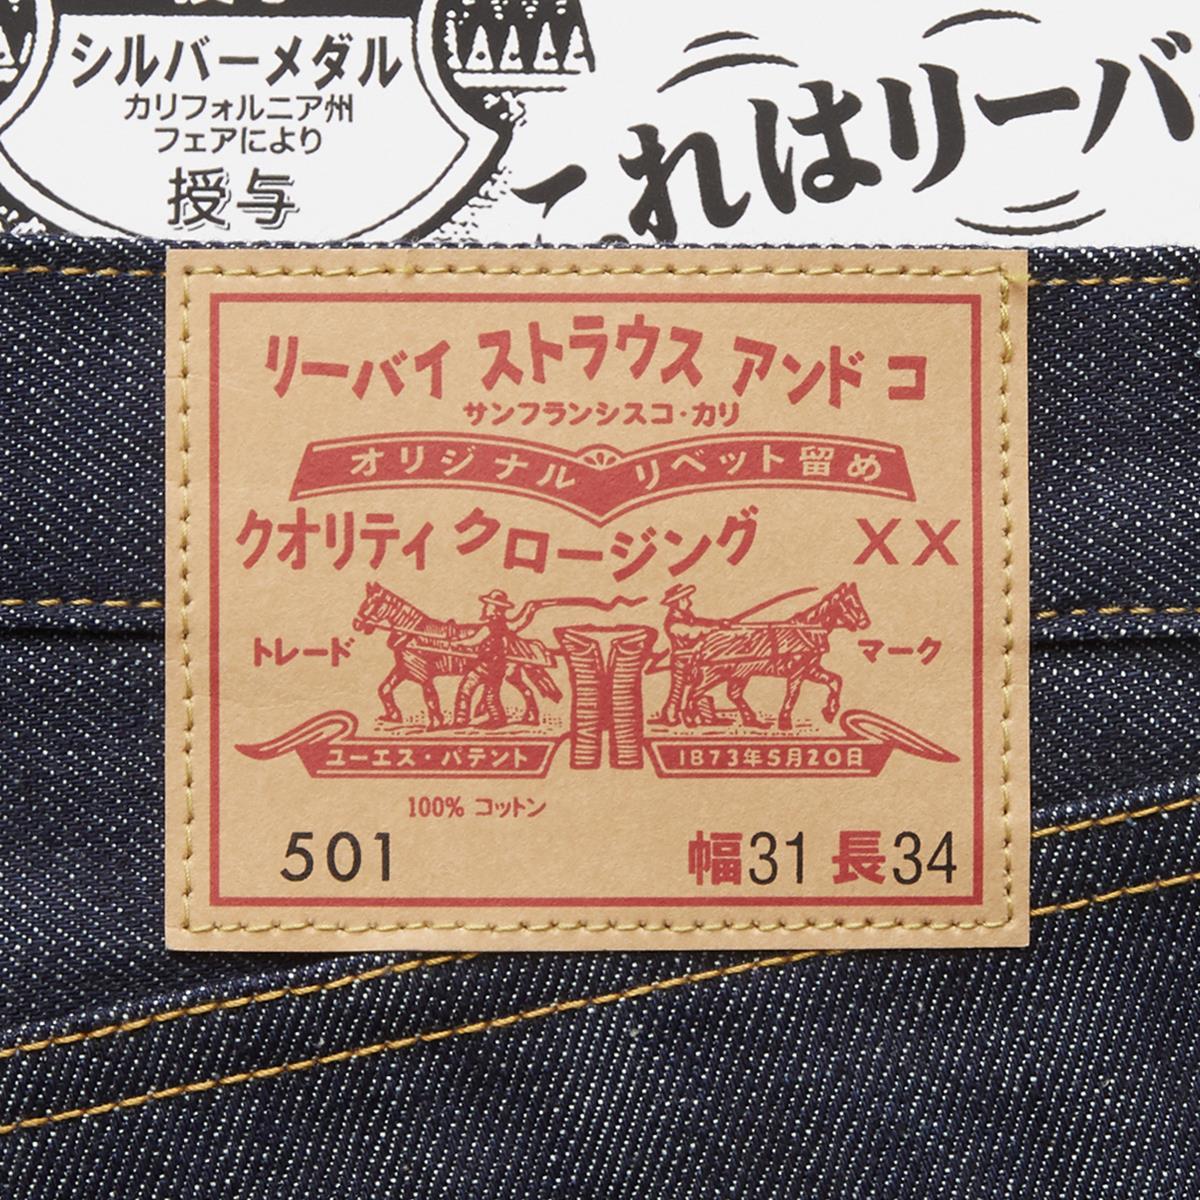 levis vintage clothing denim giapponese (1)